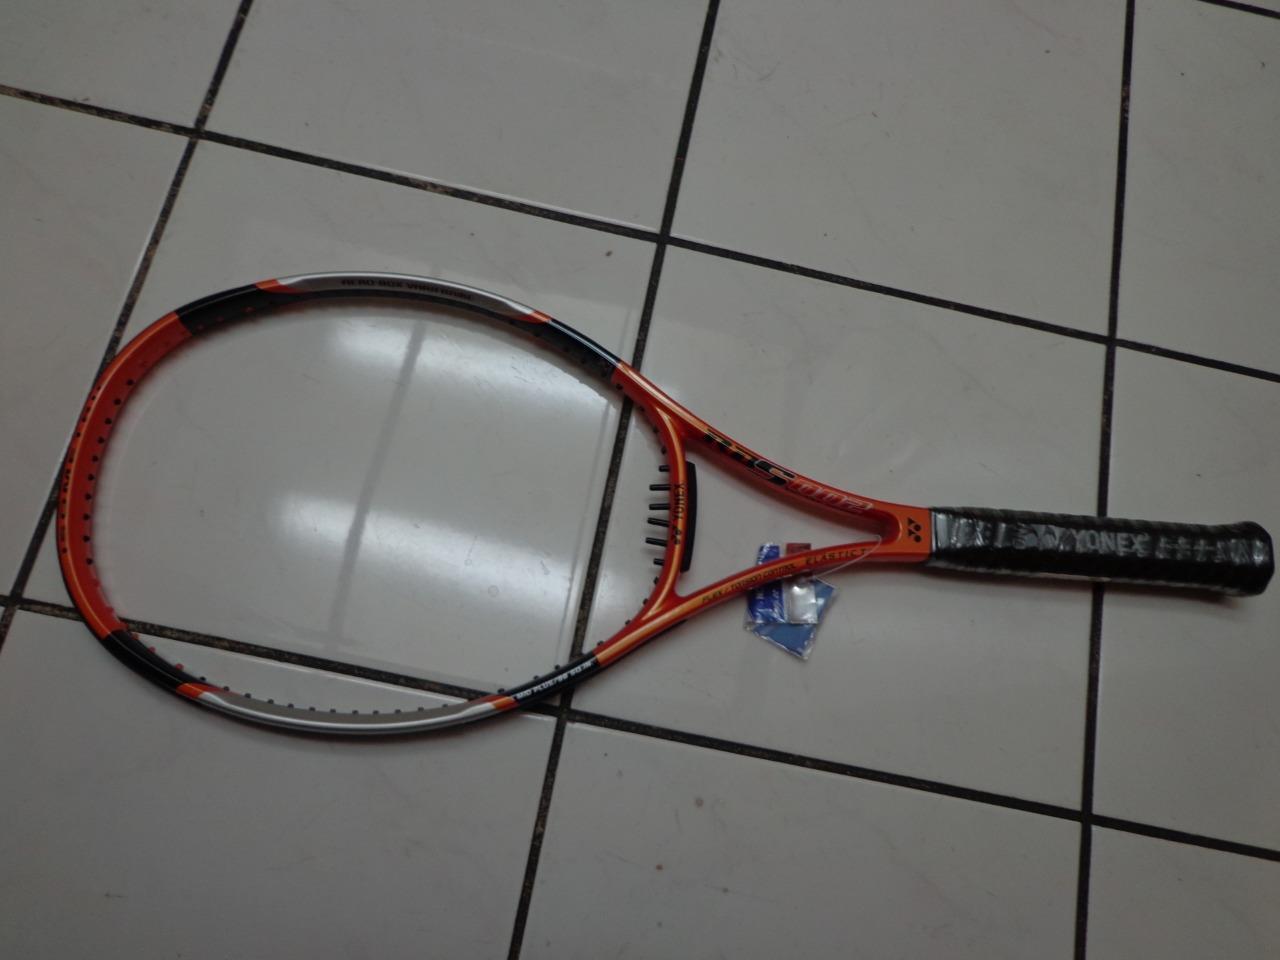 Nuevo Cabezal Yonex Rds 002 98 300 Gr 10.6 OZ (approx. 300.50 g) 4 3 8 Grip Tenis Raqueta